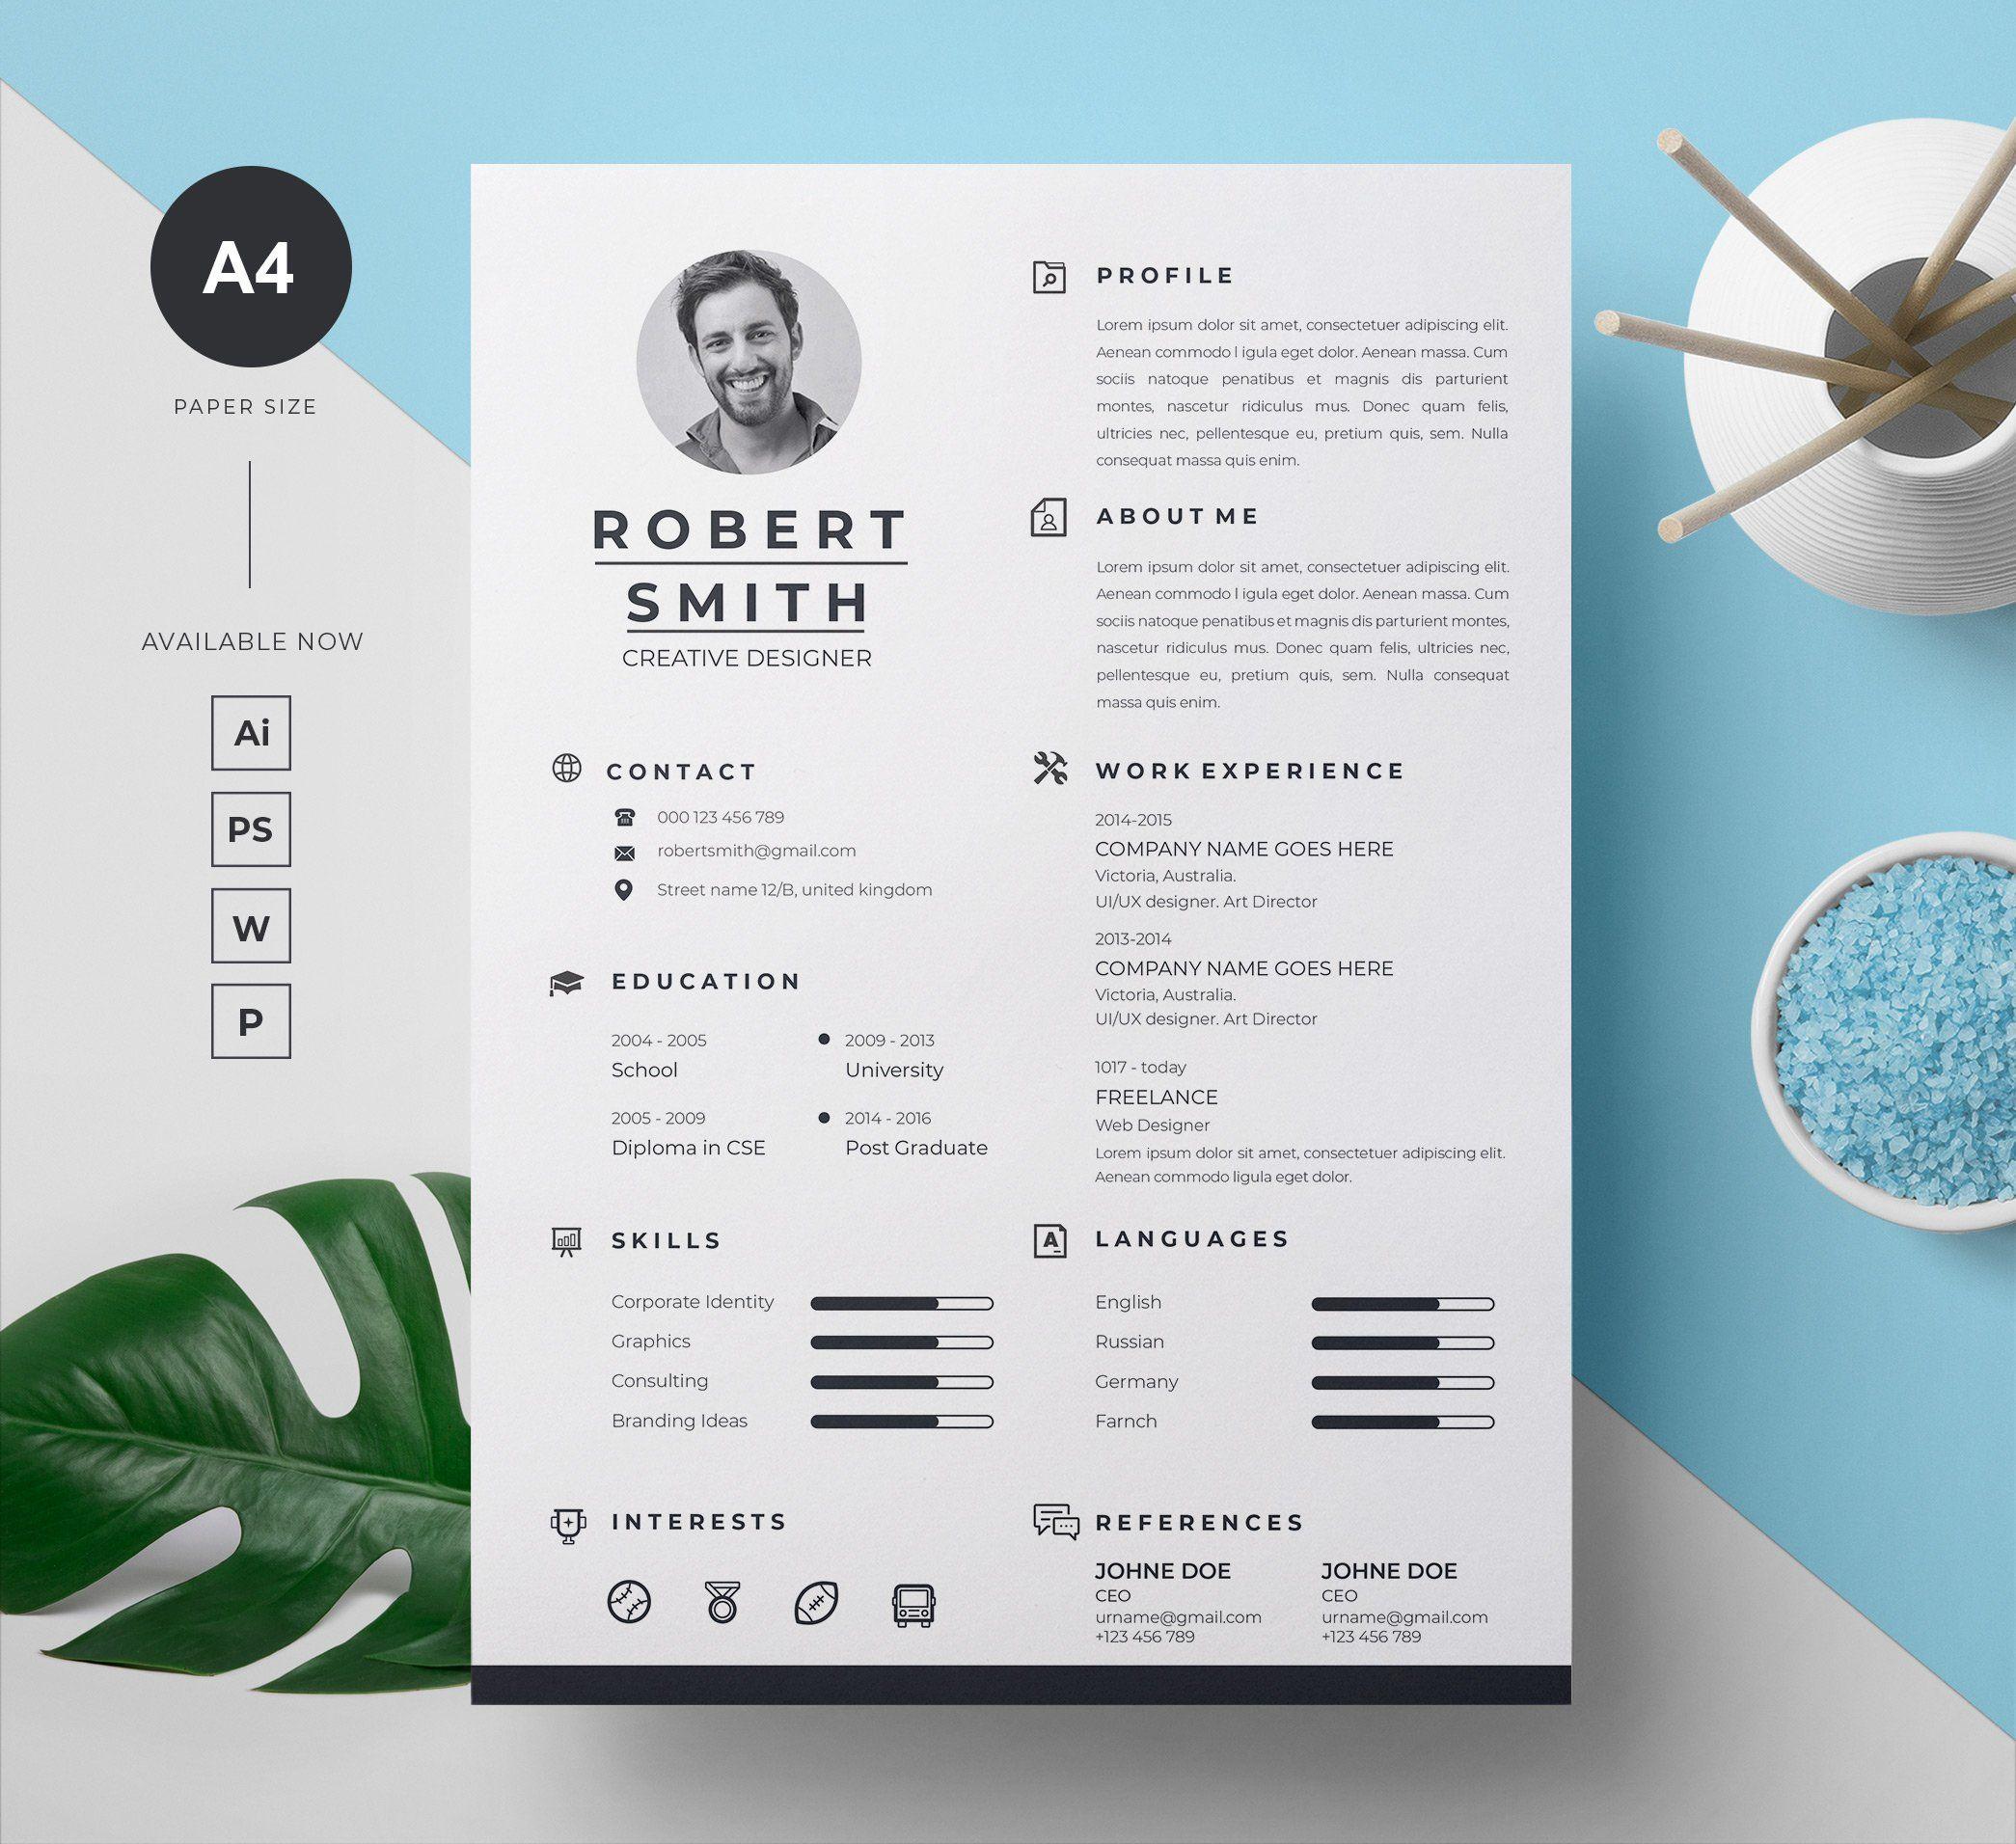 Resume Cover letter template, Resume